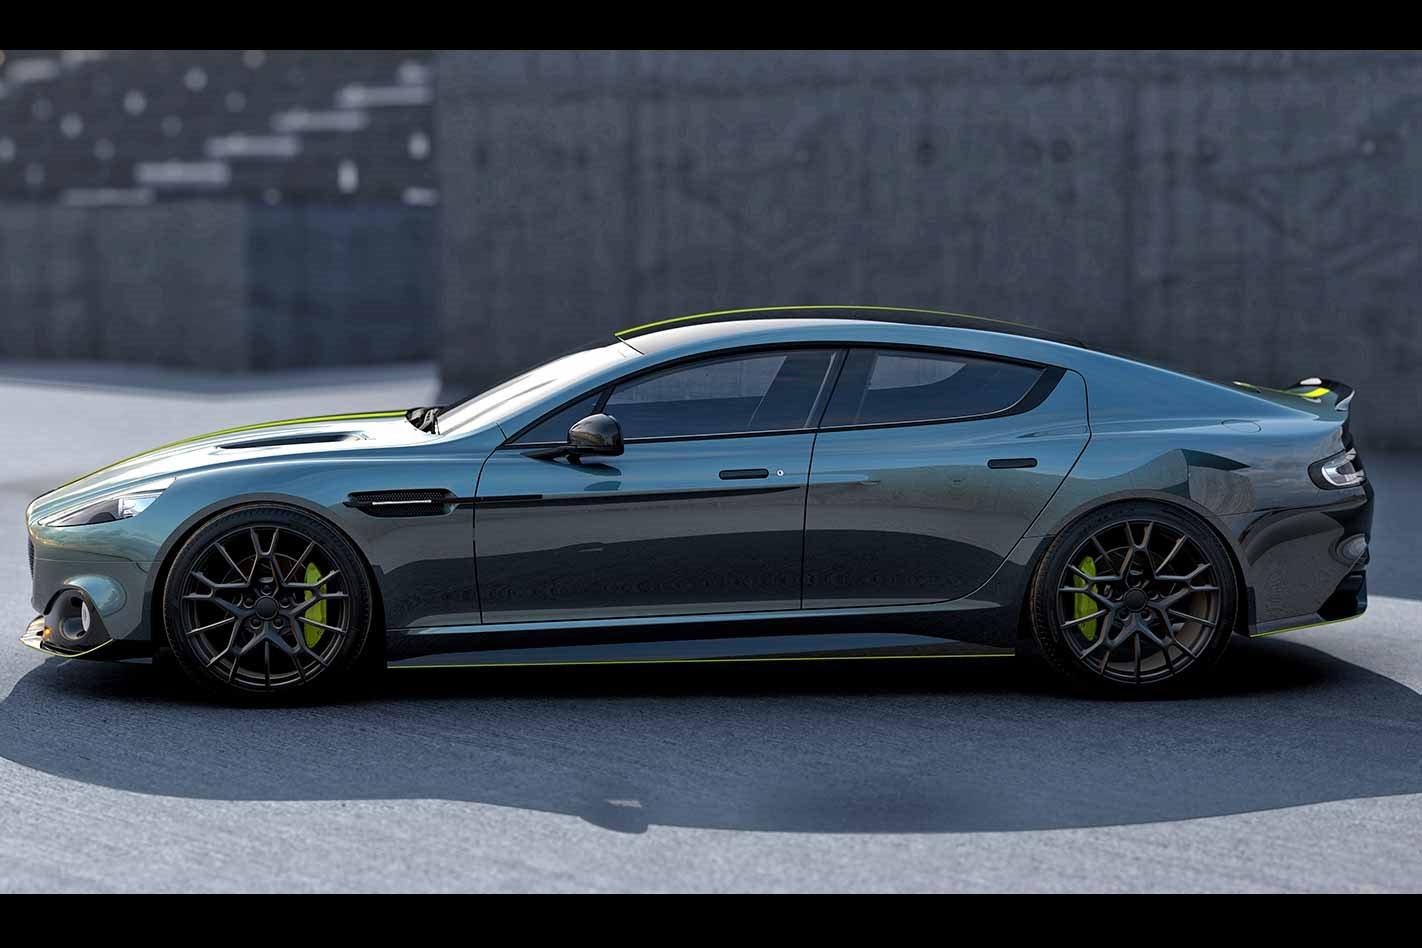 Aston Martin Rapide AMR profile